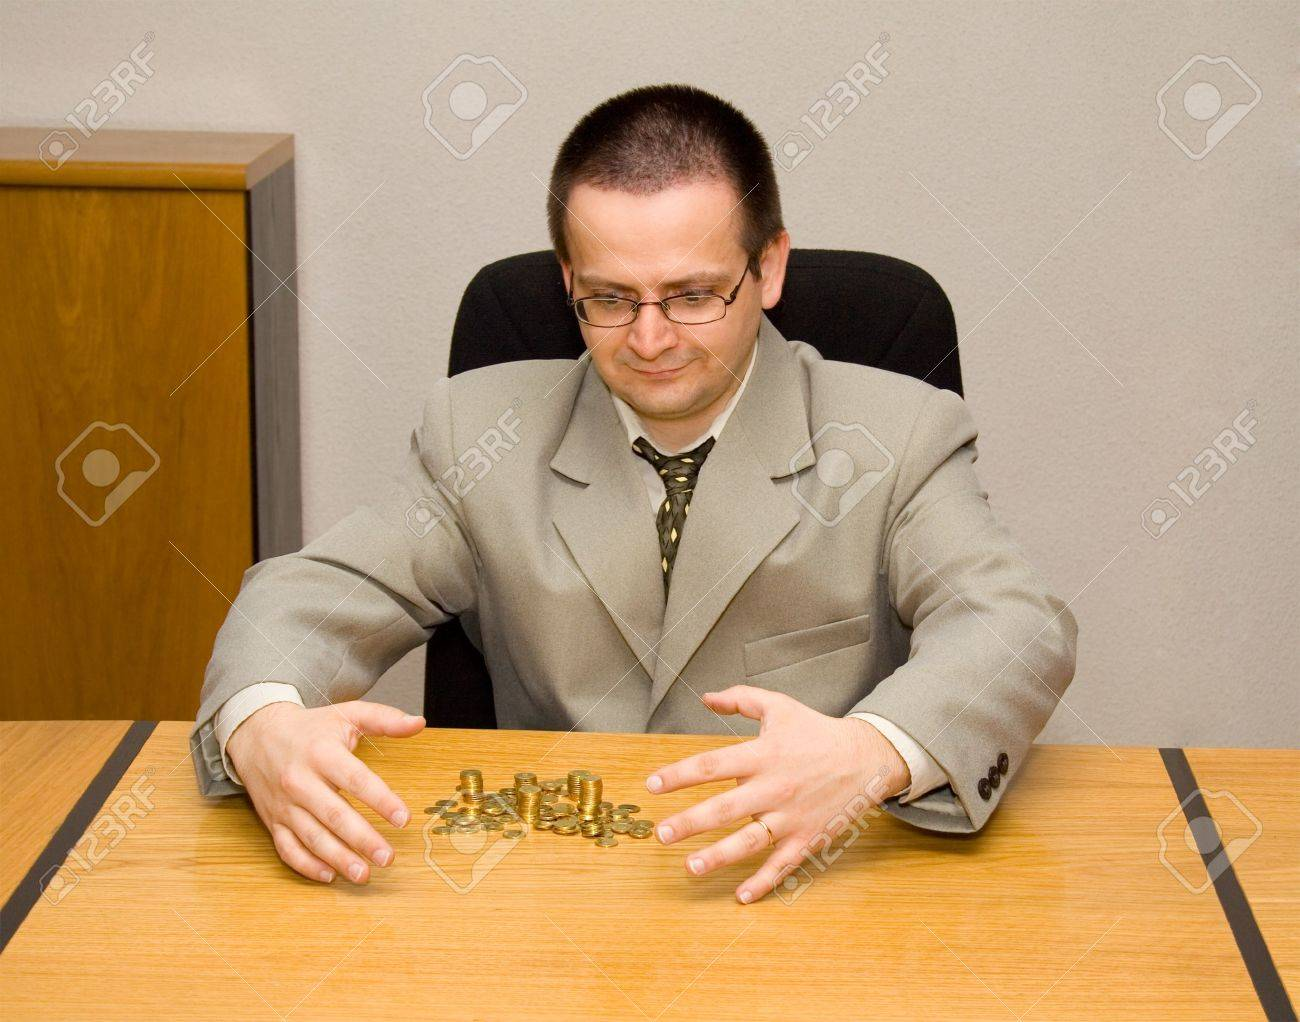 Man grabbing a pile of golden coins - concept for greed, bonus Stock Photo - 885589